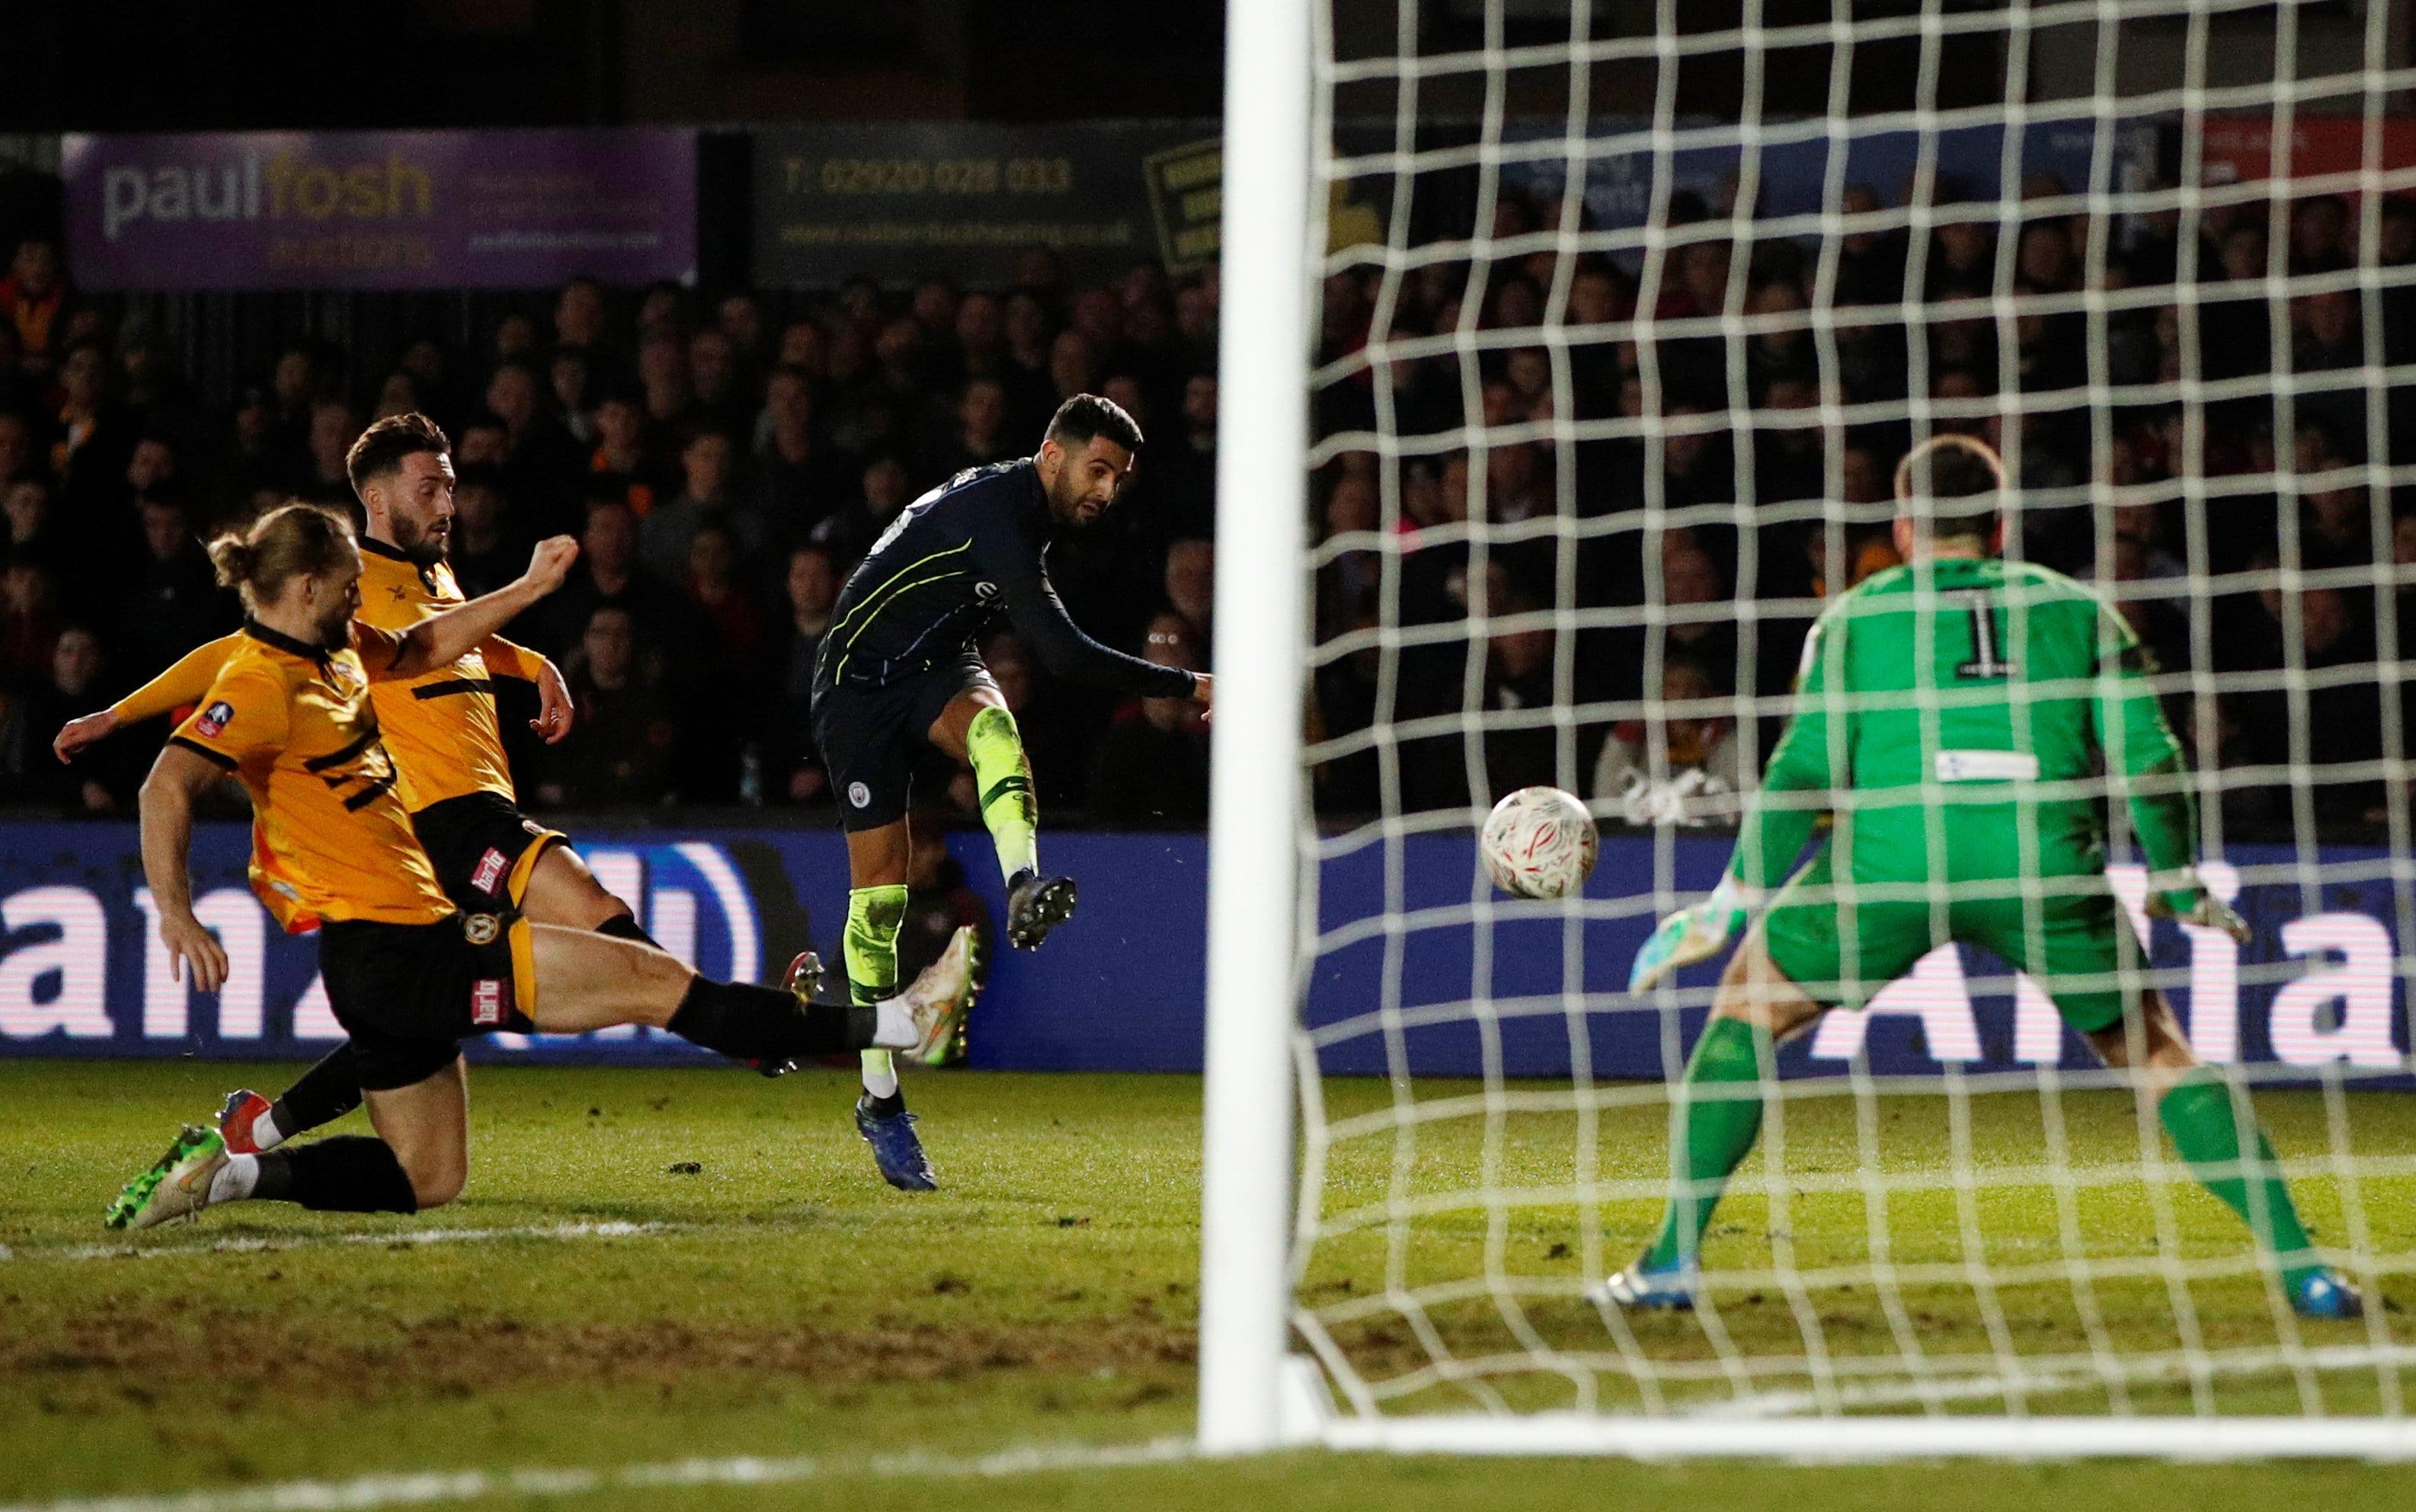 Man City end Newport's Cup dream to reach quarter-finals